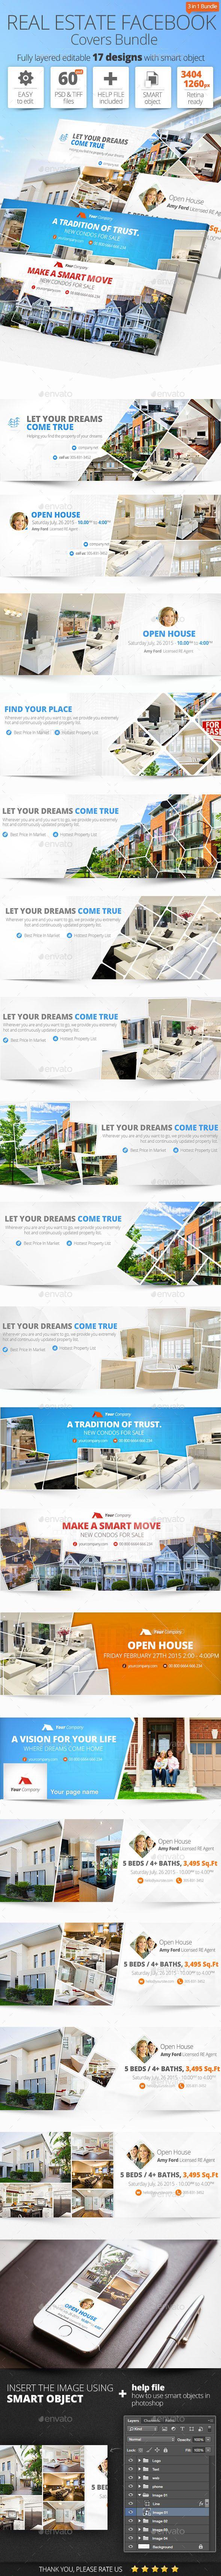 real estate facebook cover bundle designs timeline covers real estate facebook cover bundle 17 designs template graphicriver